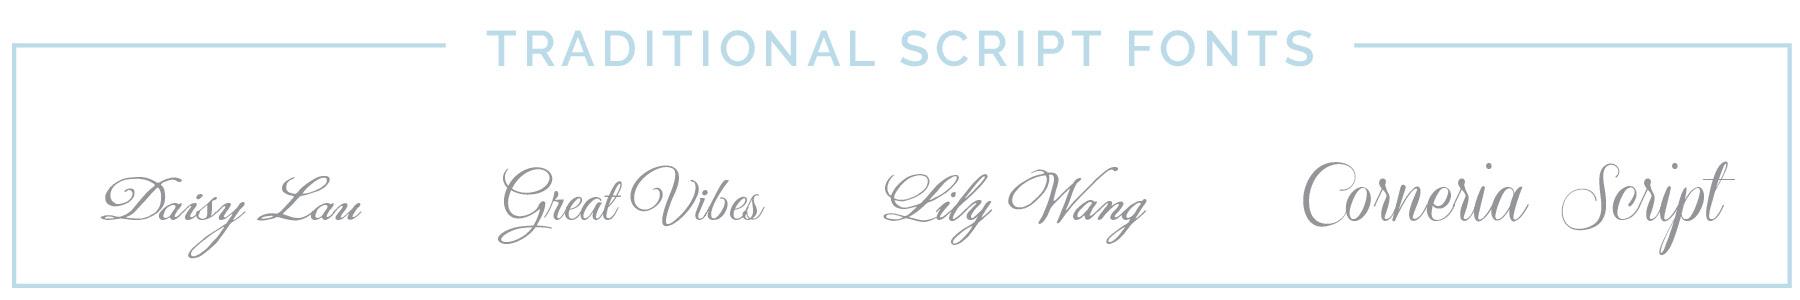 Traditional Script Fonts | casilong.com #casilongdesign